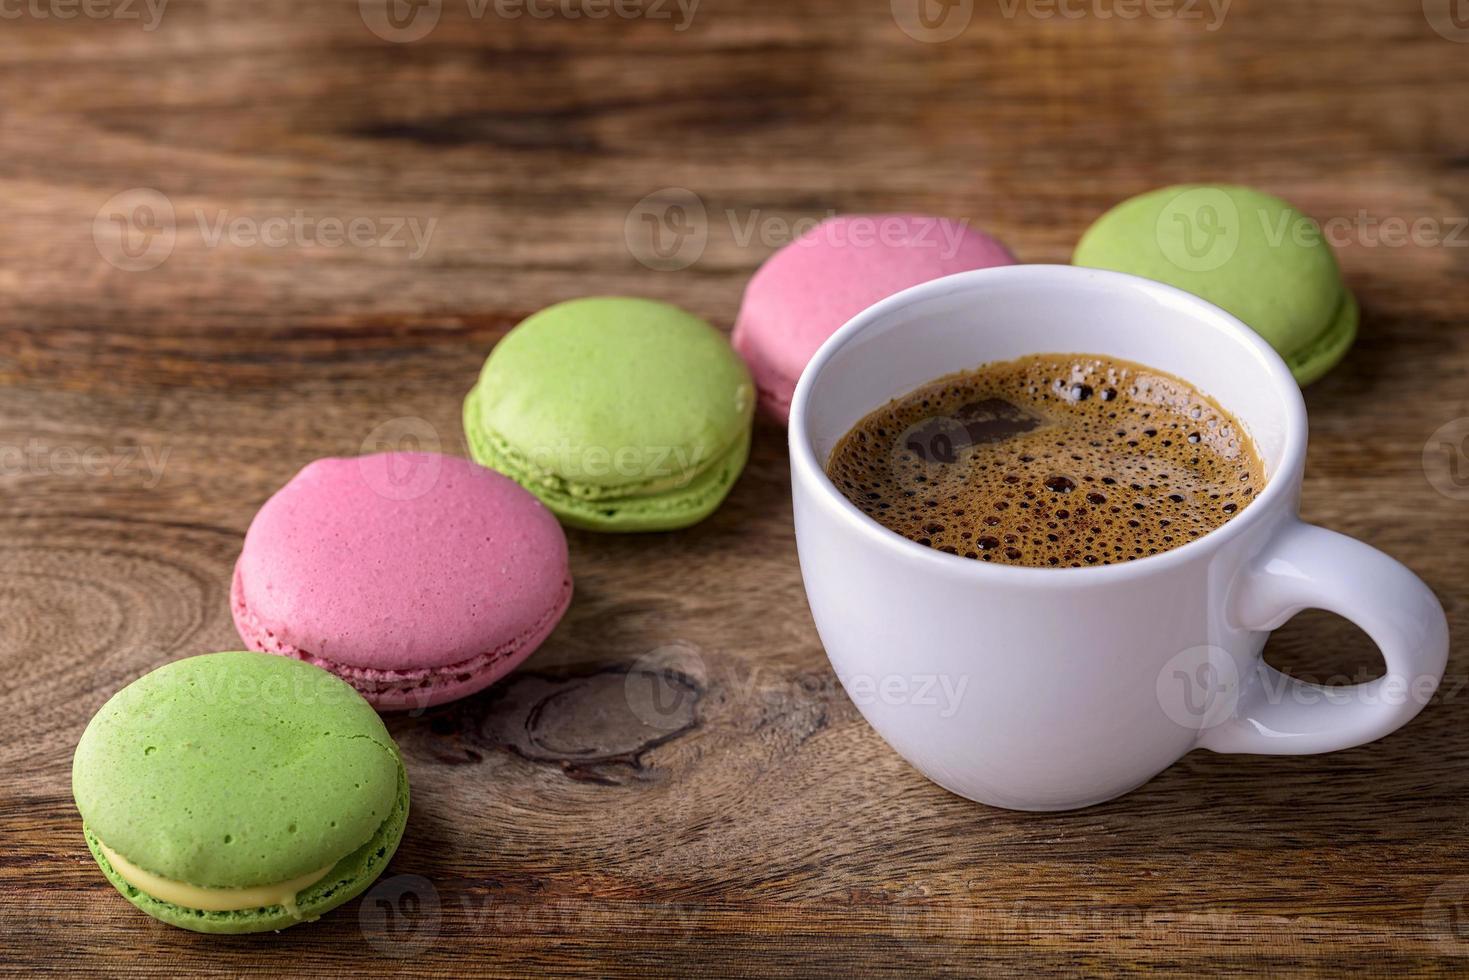 koffie en macaron foto